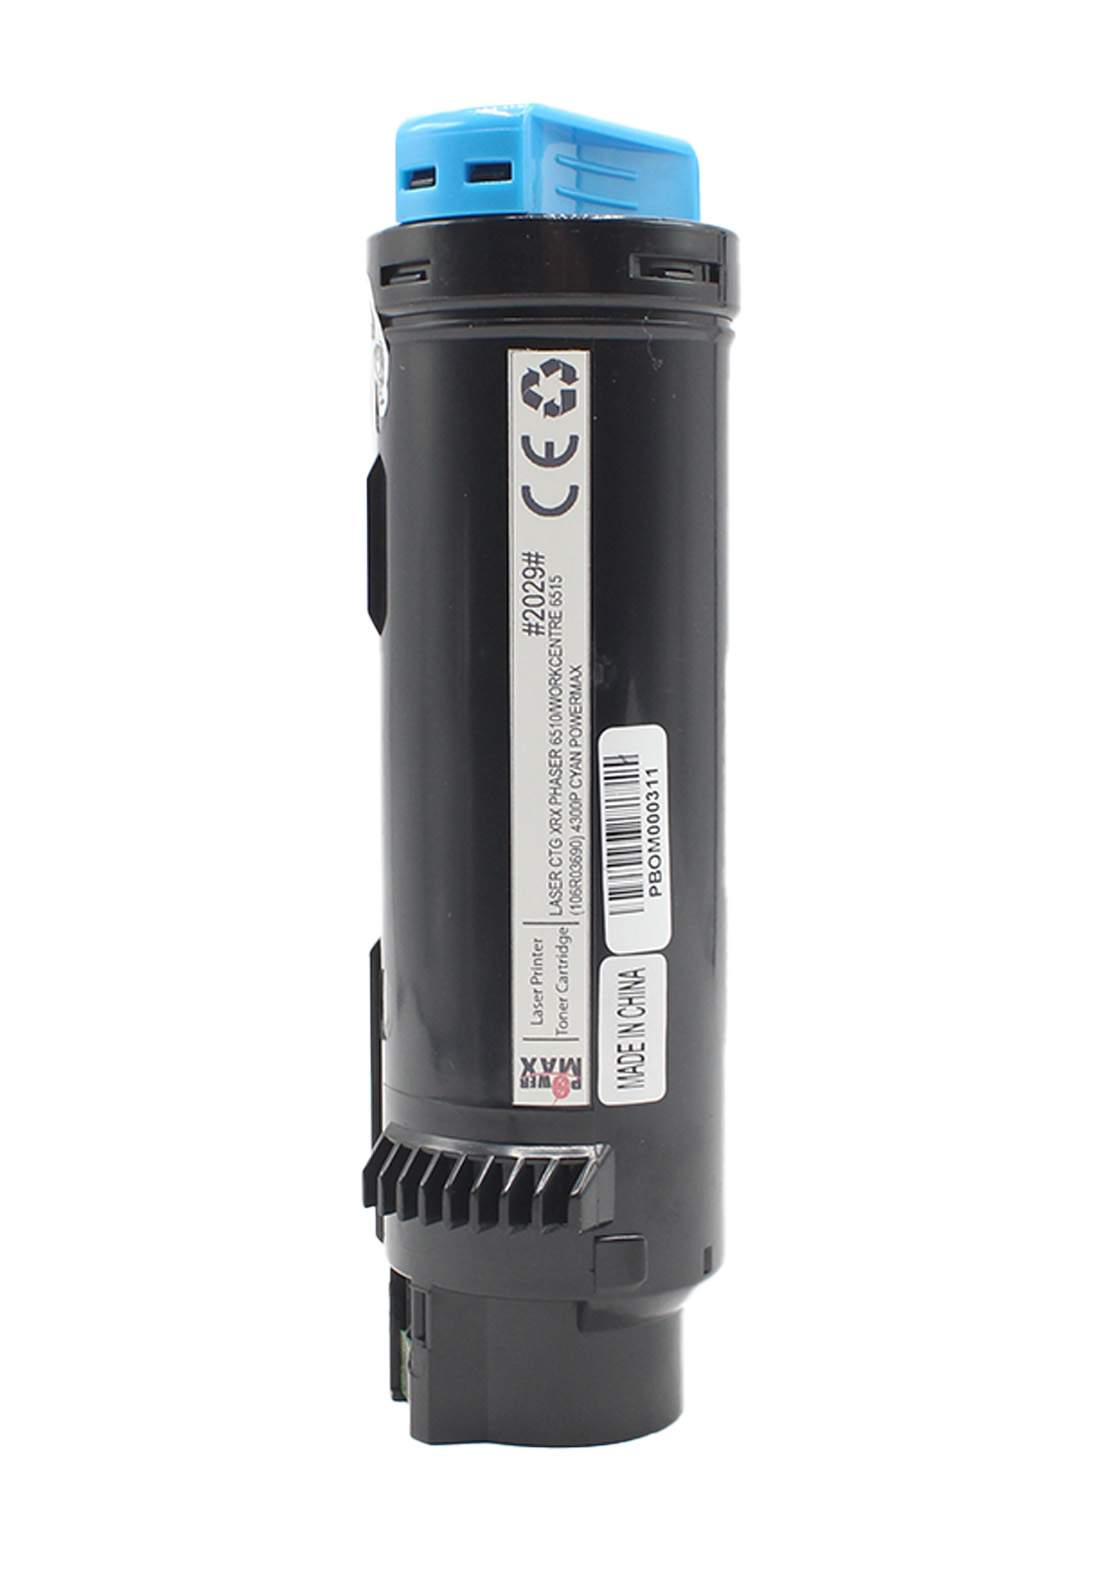 Power Max CTG Xerox Phaser 6510/ Workcentre 6515 (106R03690) 4300P Laser Printer Toner Cartridge خرطوشة حبر